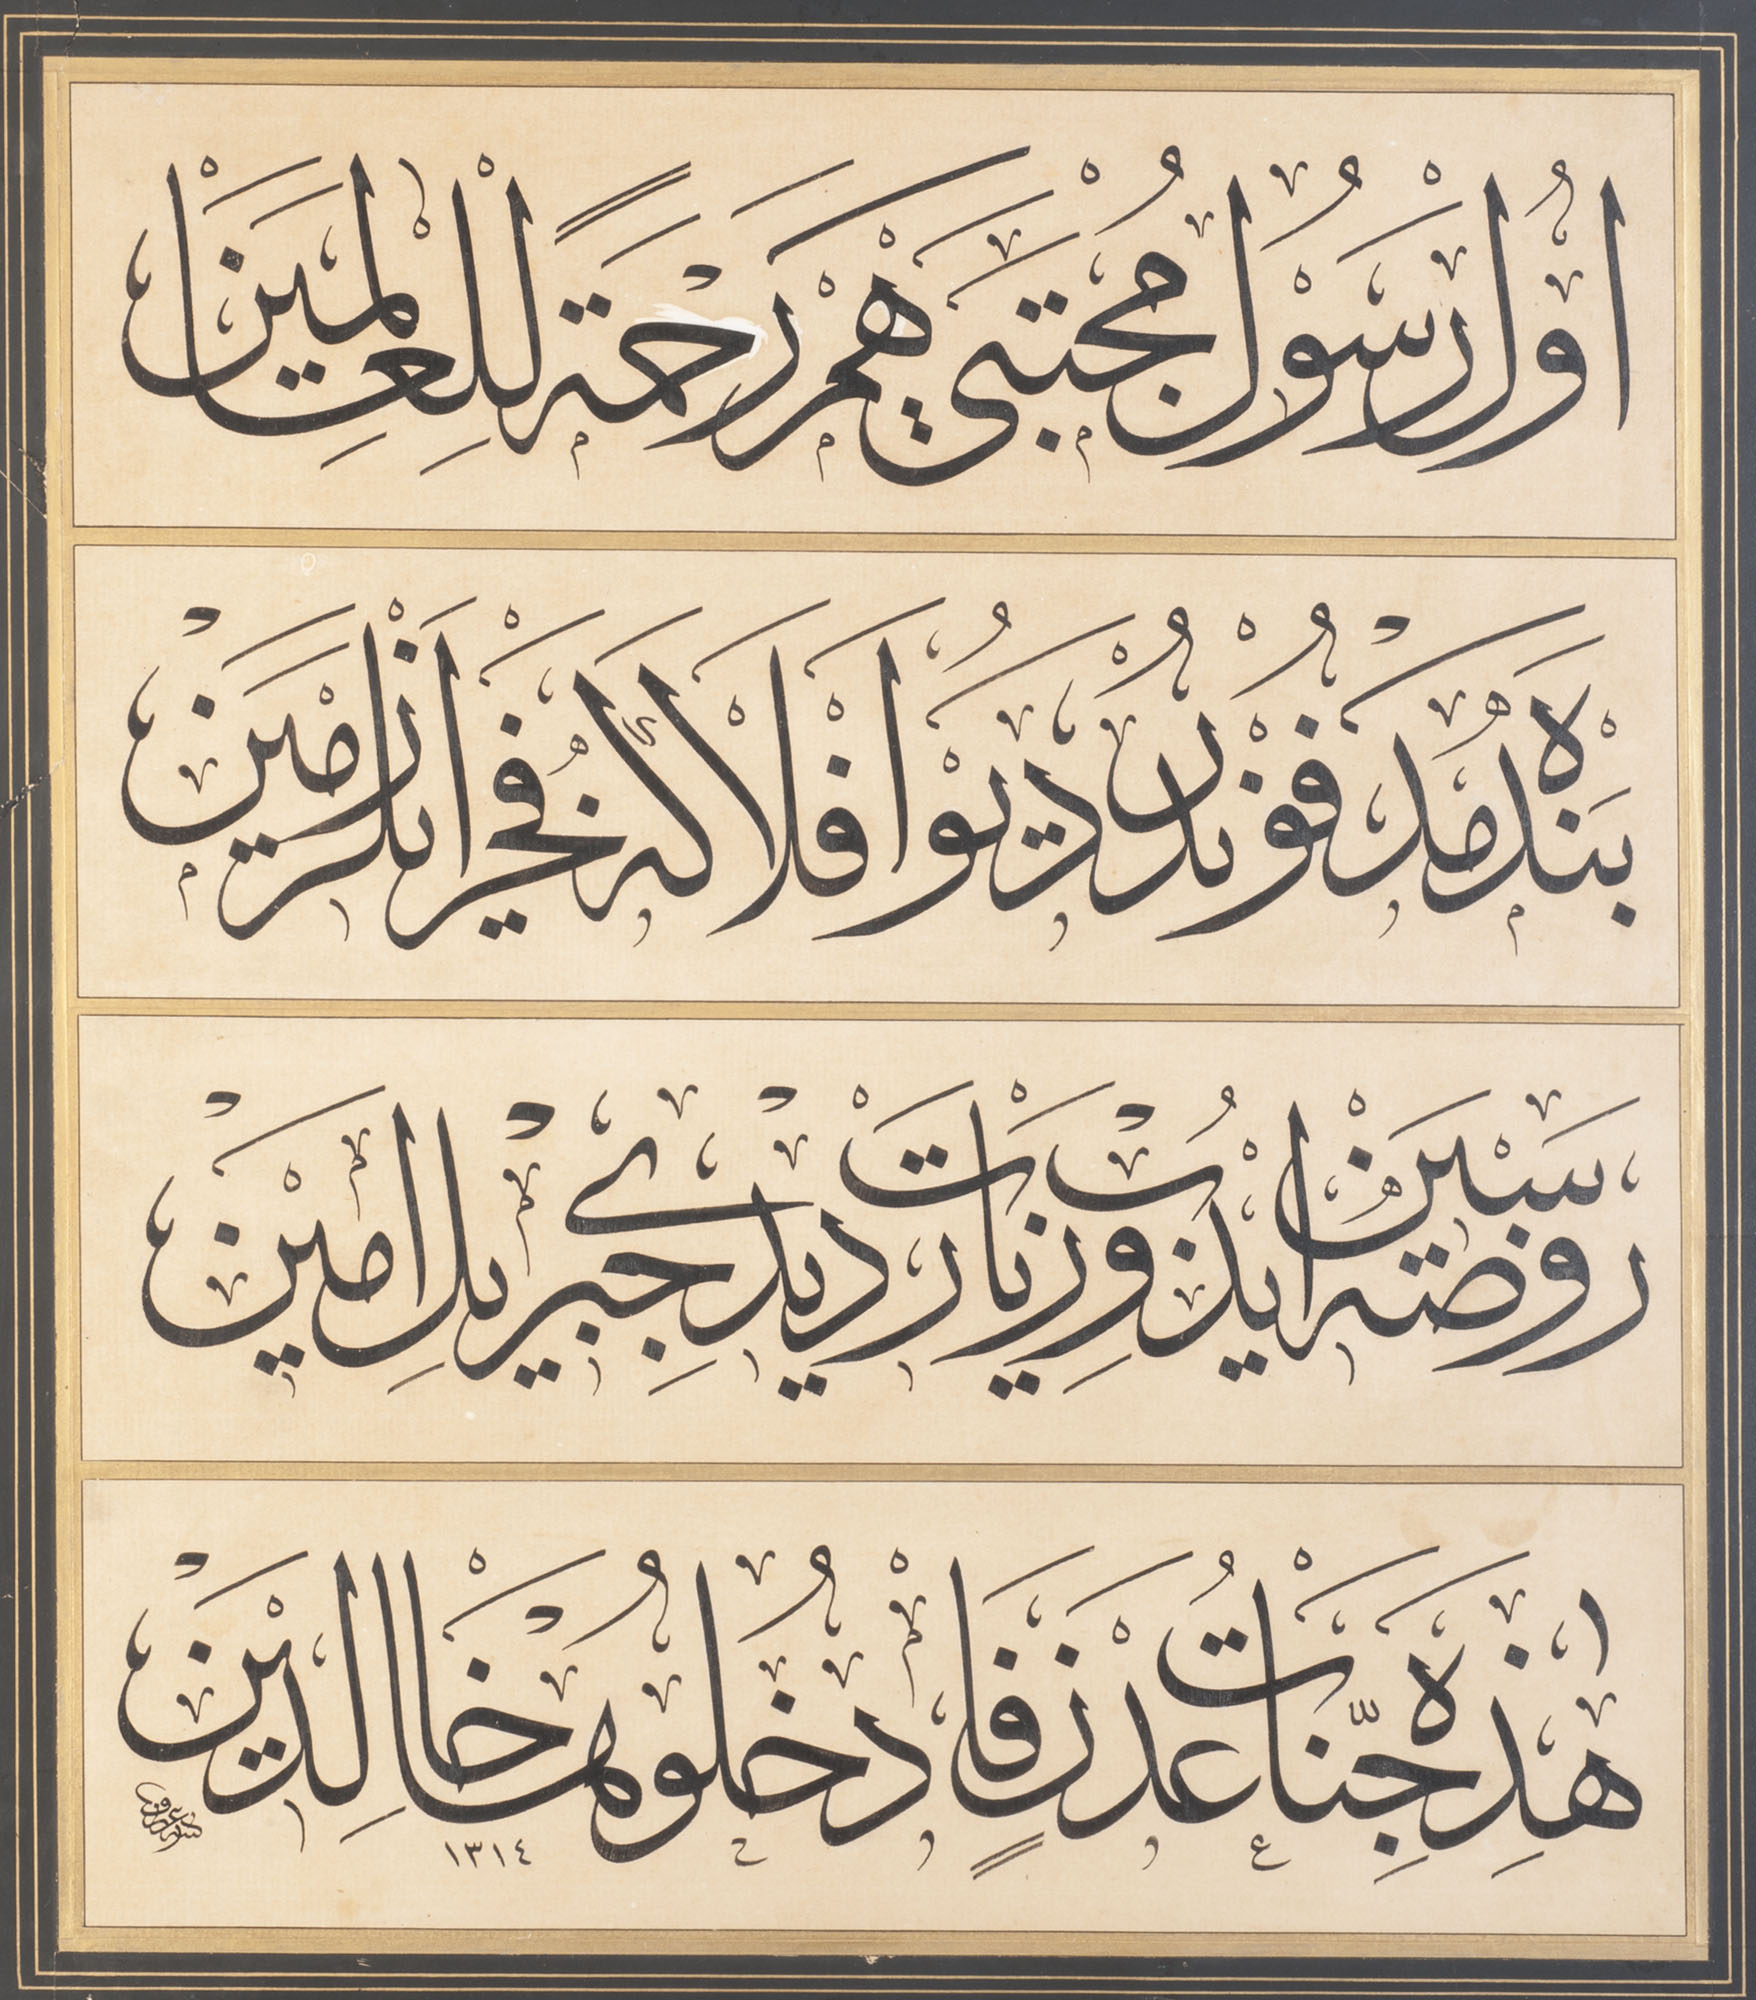 Hz. Muhammed'in kabri hakkında levha